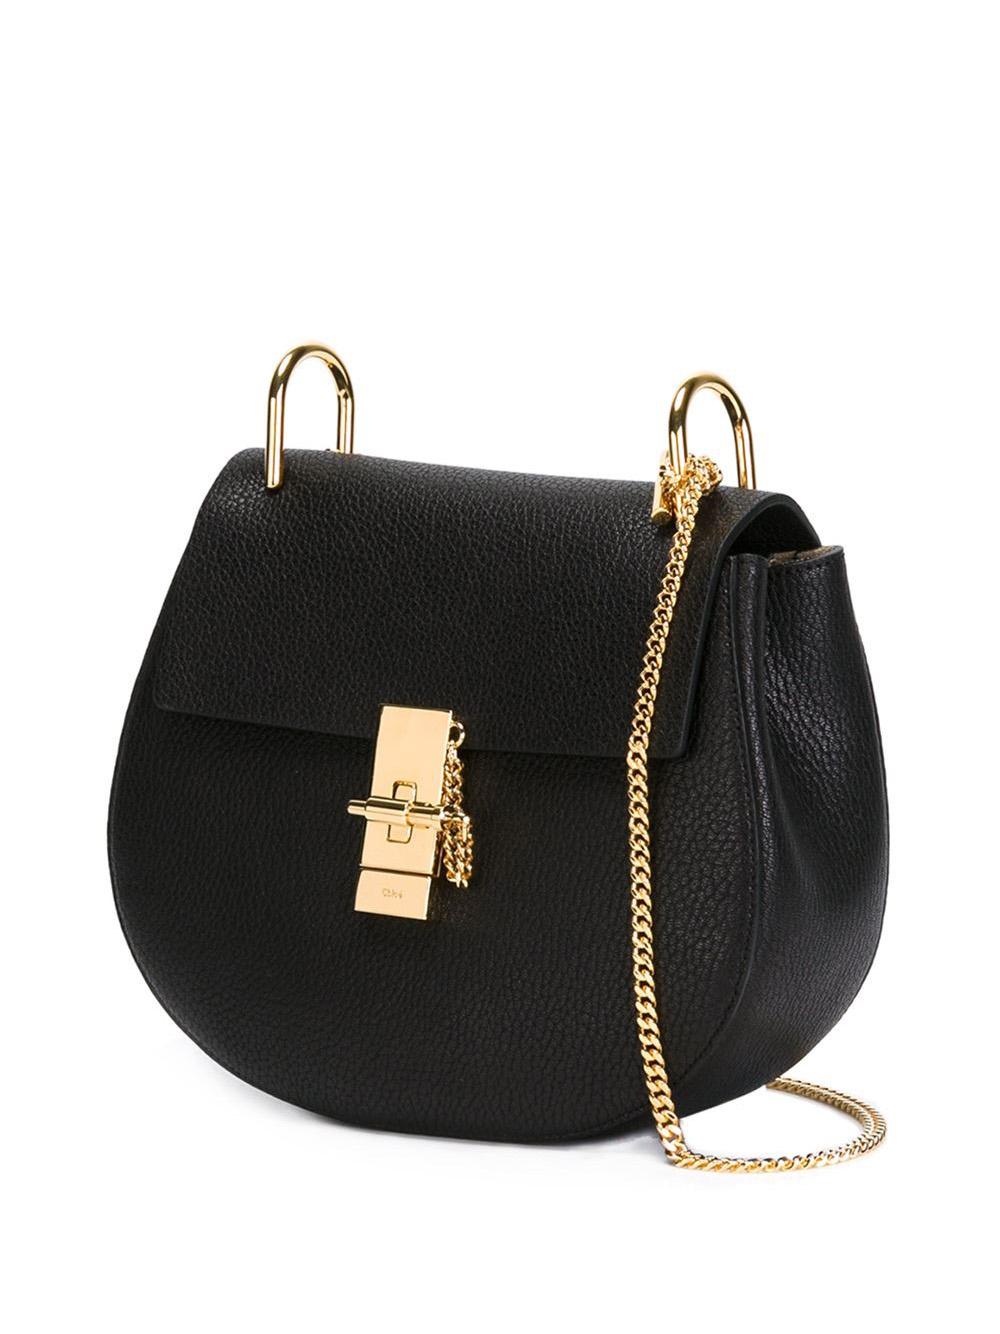 see by chloe purse - nano drew bag in grained calfskin and nappa lambskin